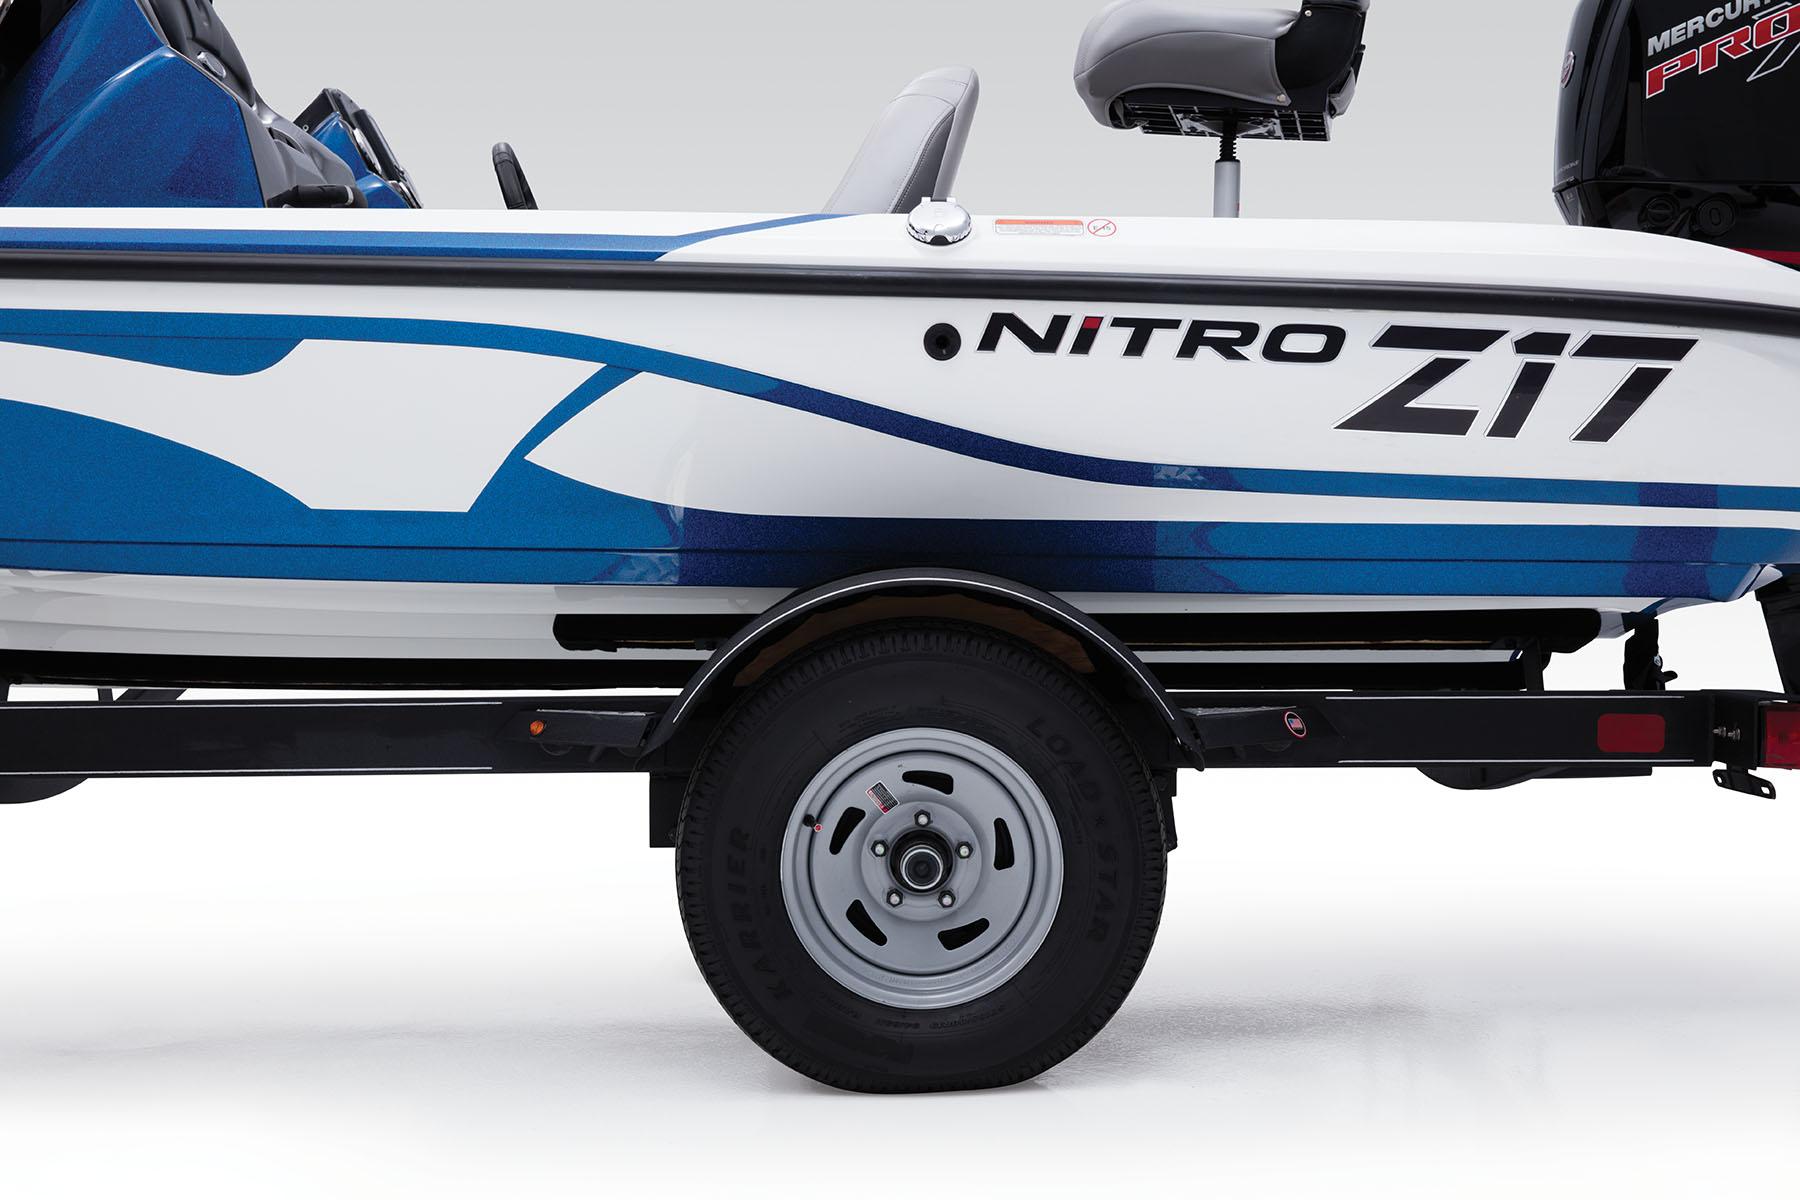 2018 Nitro Z17 Bass Boat Bilge Pump Wiring Diagram